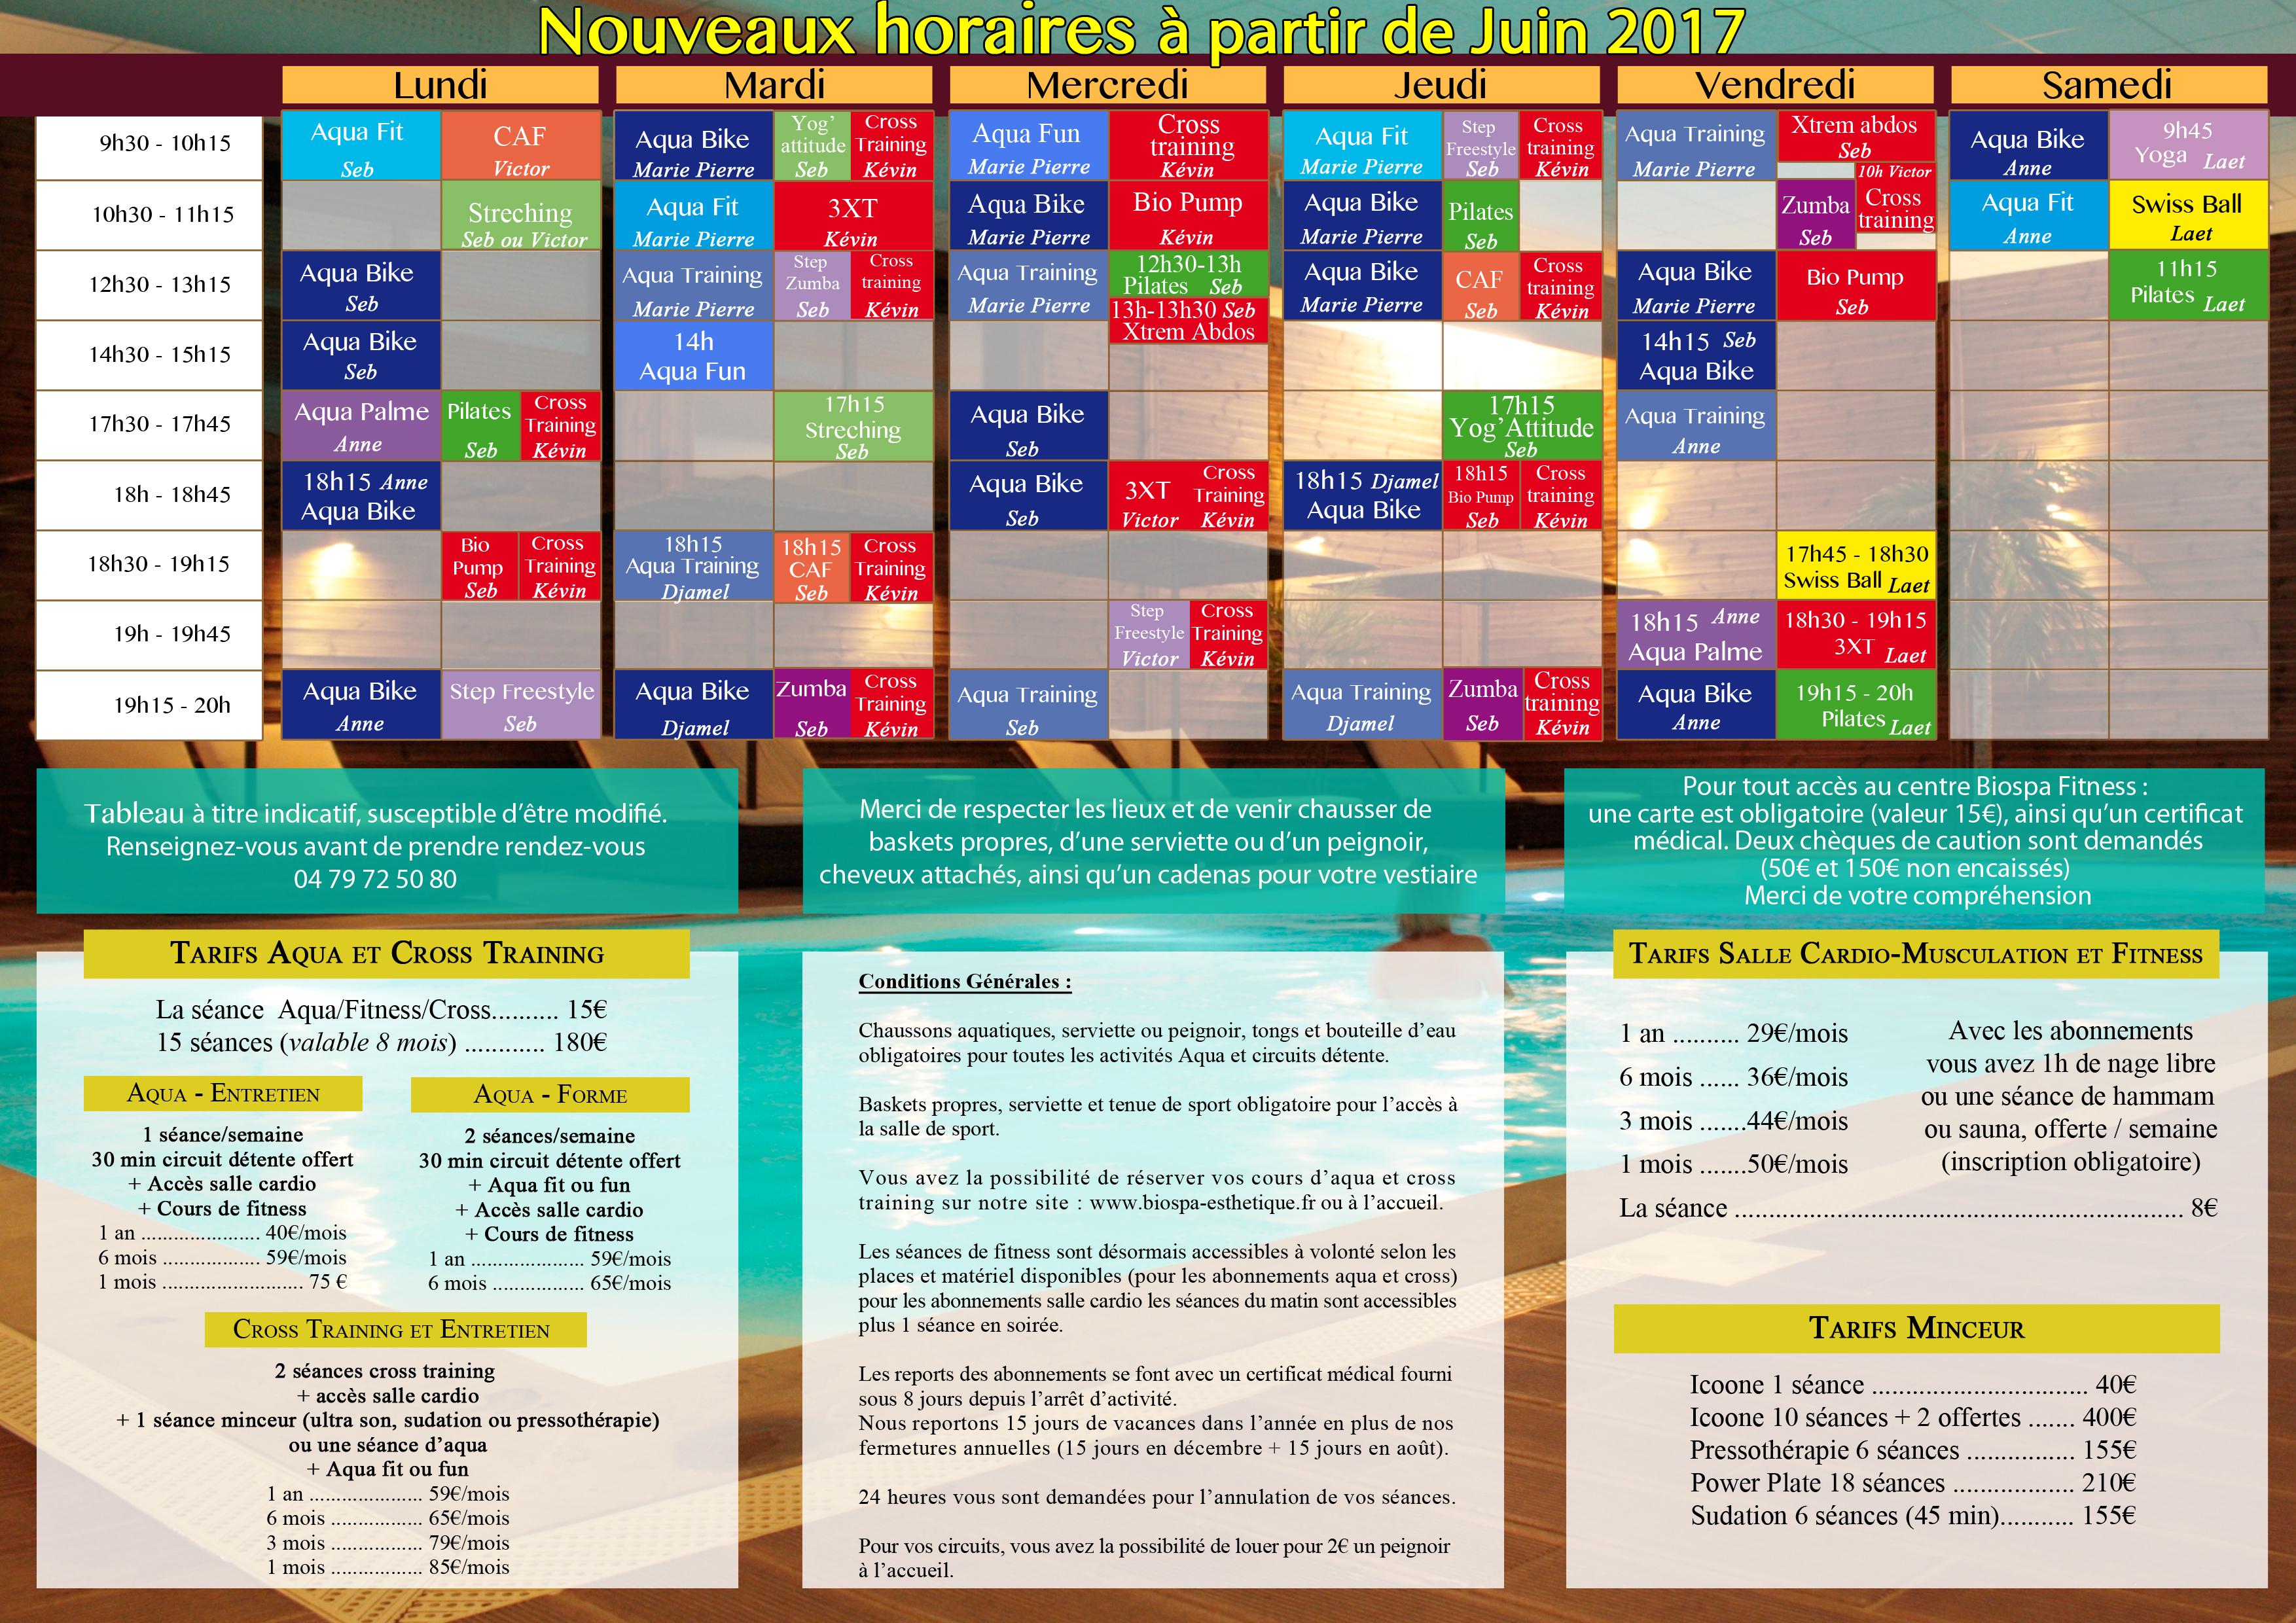 Planning-tarifs-aqua-ete-2017.JPG